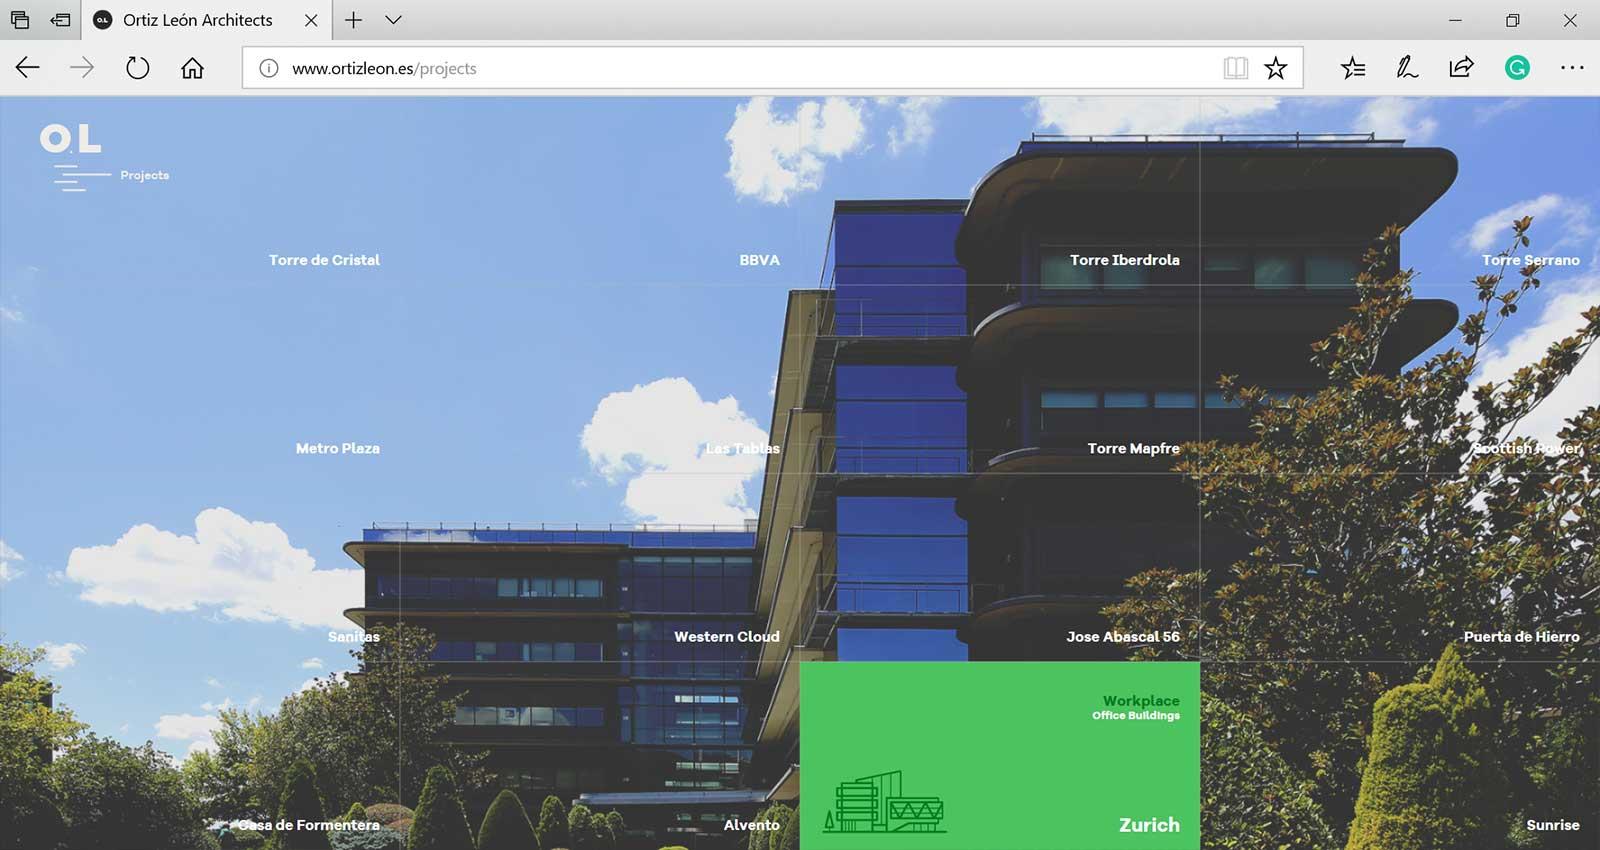 Top 15 Architecture Studio Websites of 2017 - Ortiz Leon Architects